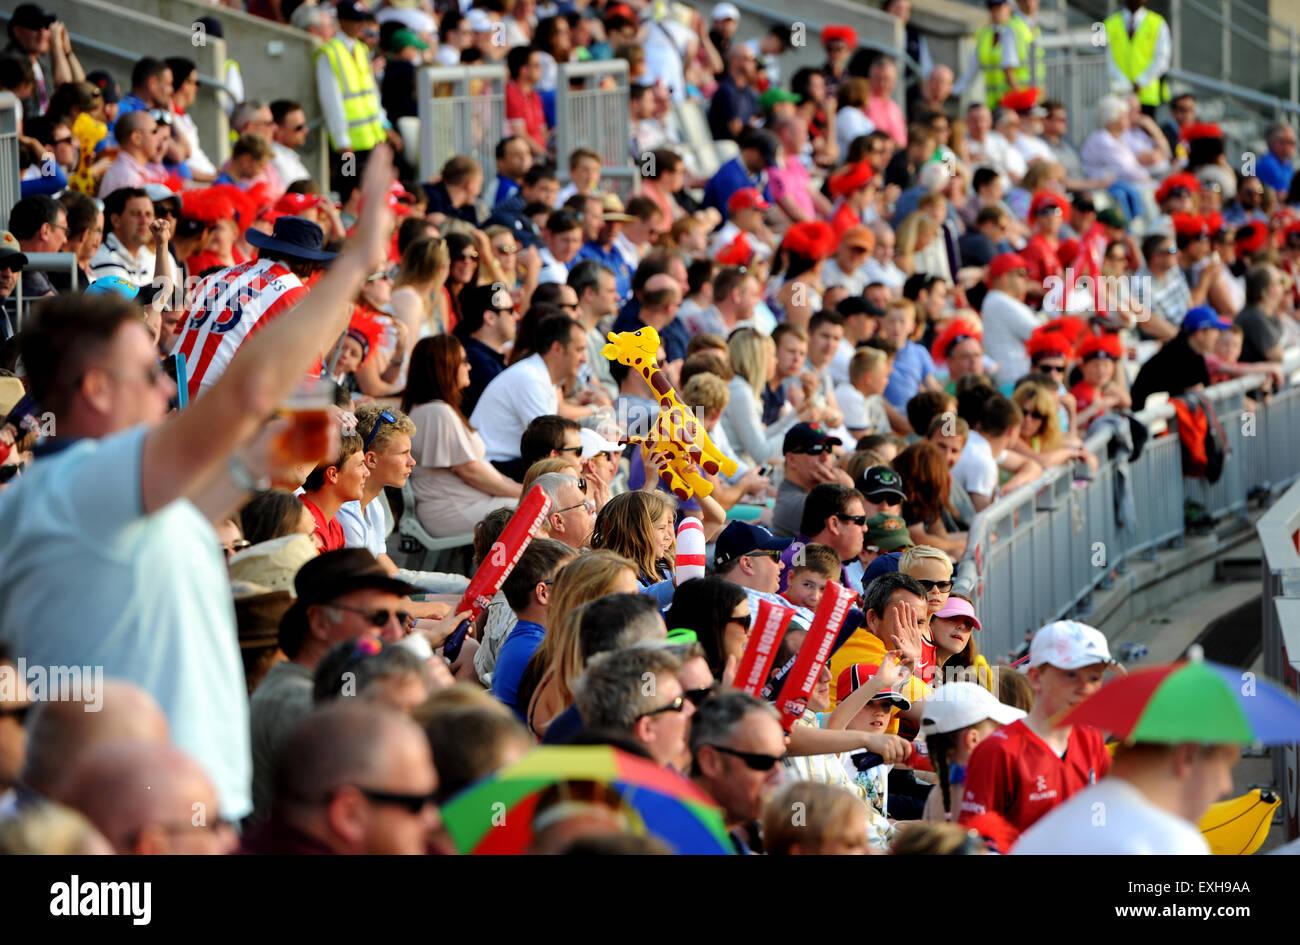 Emirates Old Trafford, Manchester. T20 Blast cricket Lancashire v Yorkshire, May 2015. - Stock Image